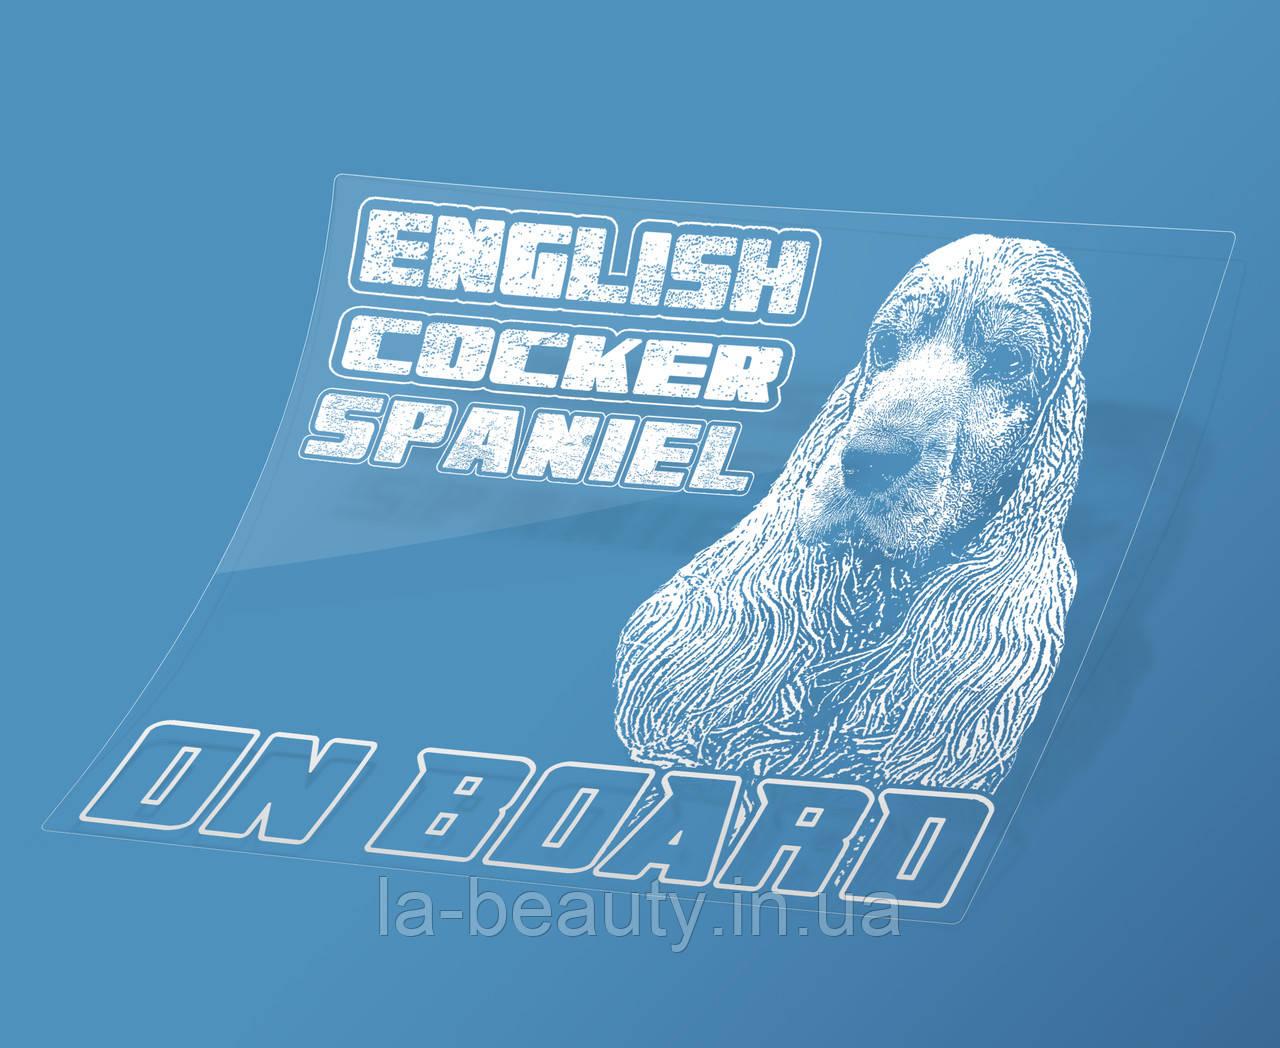 Наклейка на машину Английский кокер спаниель на борту (English Cocker Spaniel on Board)